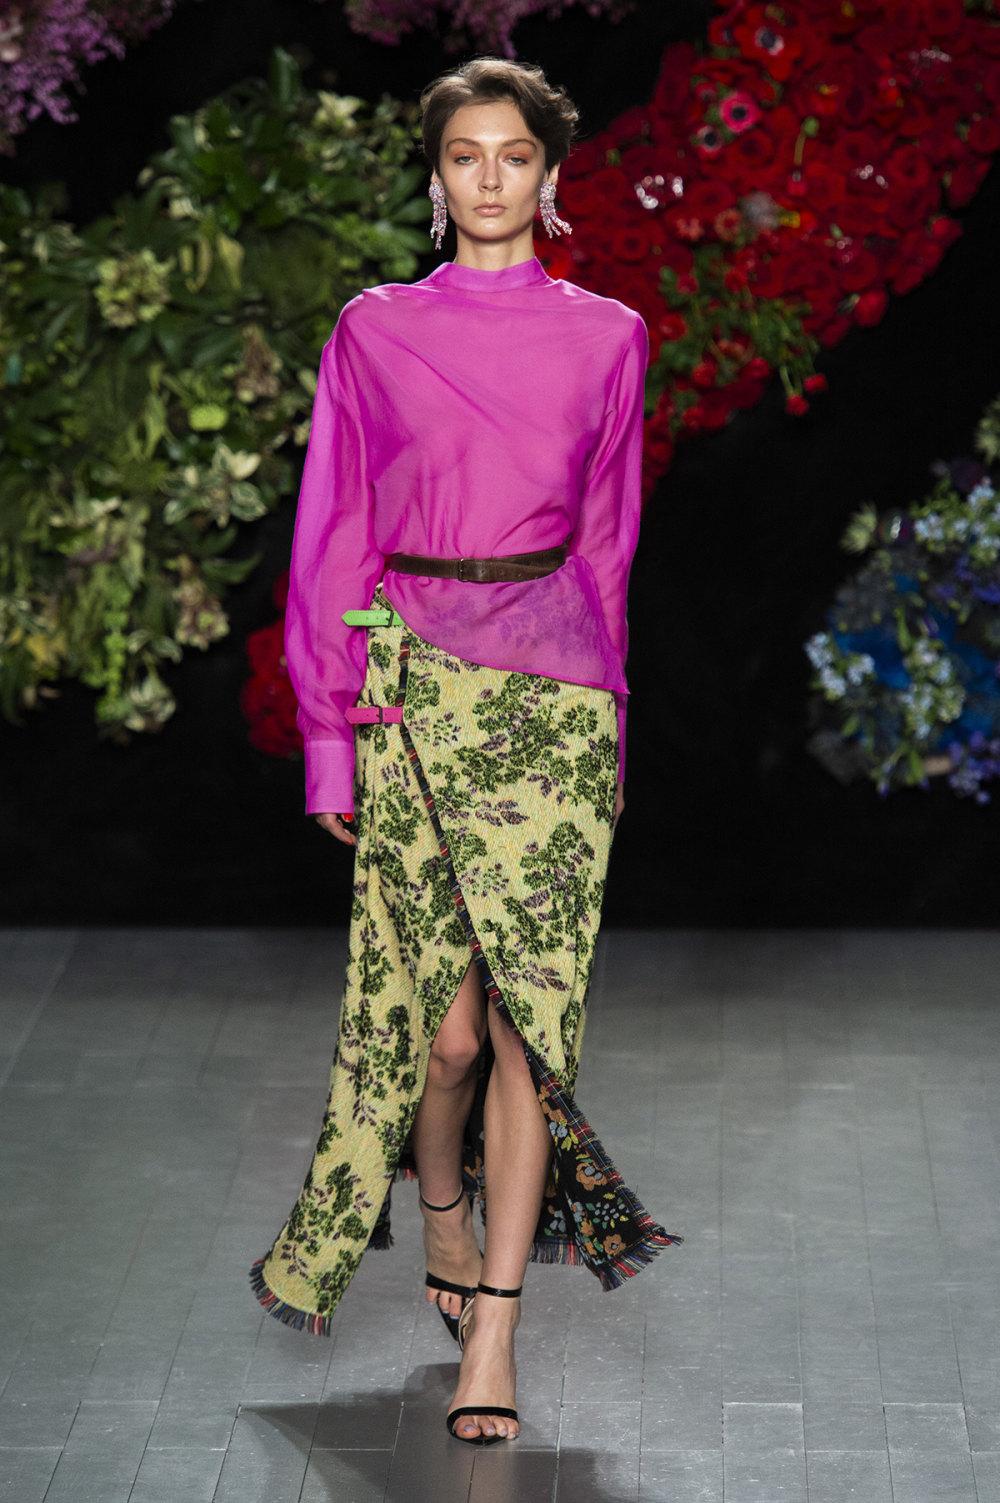 Roberta Einer时装系列格子呢西装外套收紧腰部霓虹色腰带连帽衫-16.jpg